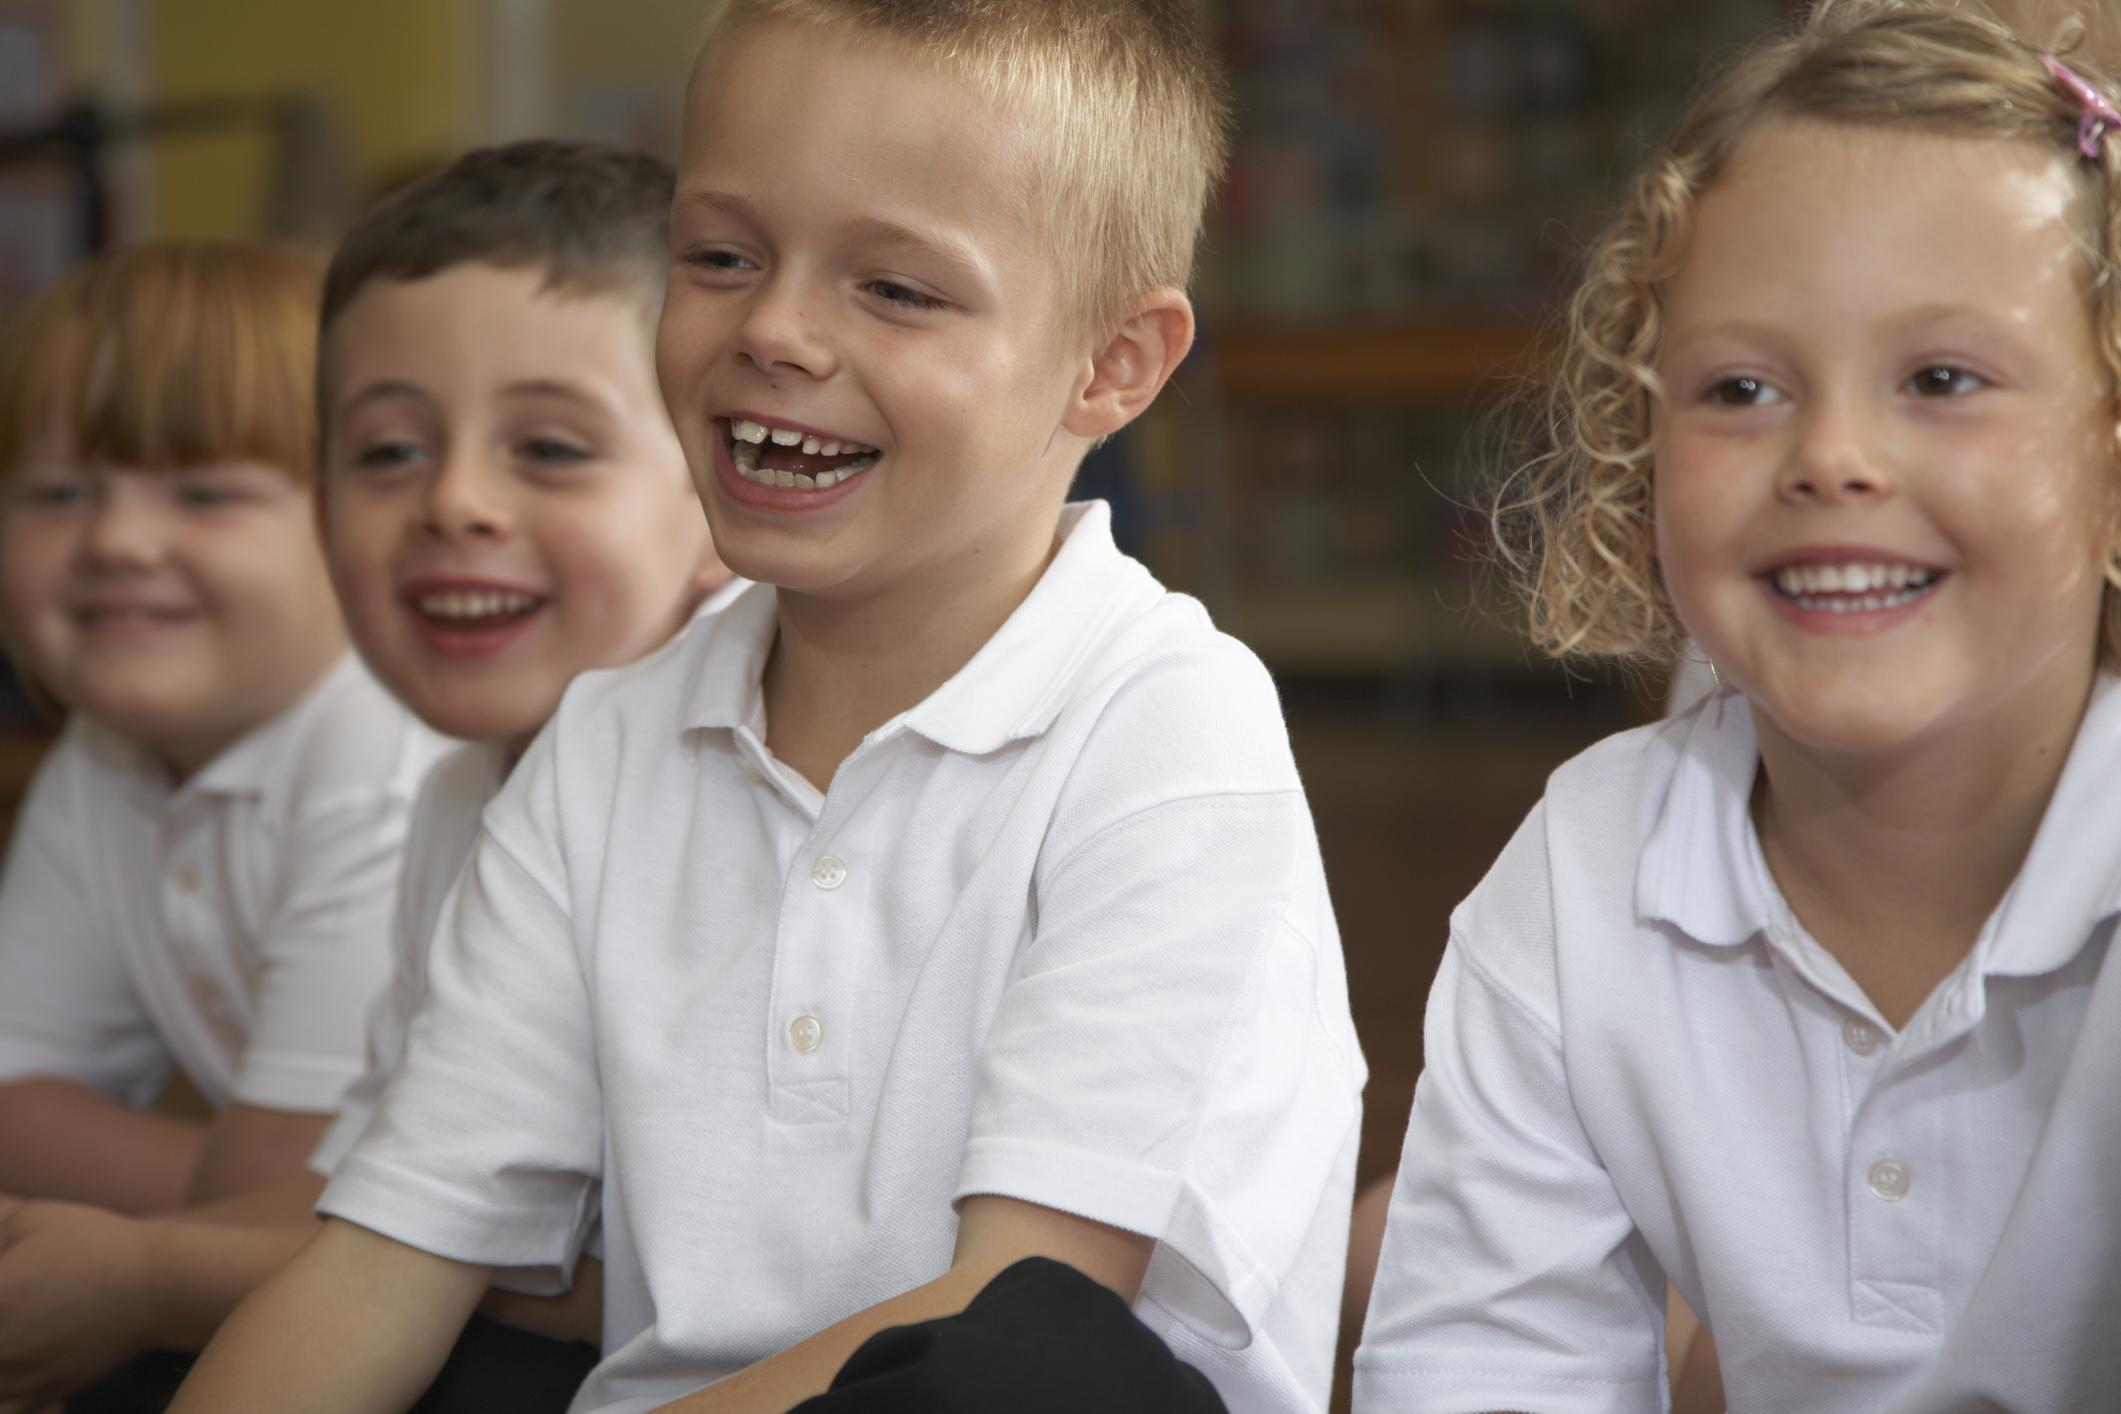 A group of schoolchildren (Thinkstock/PA)